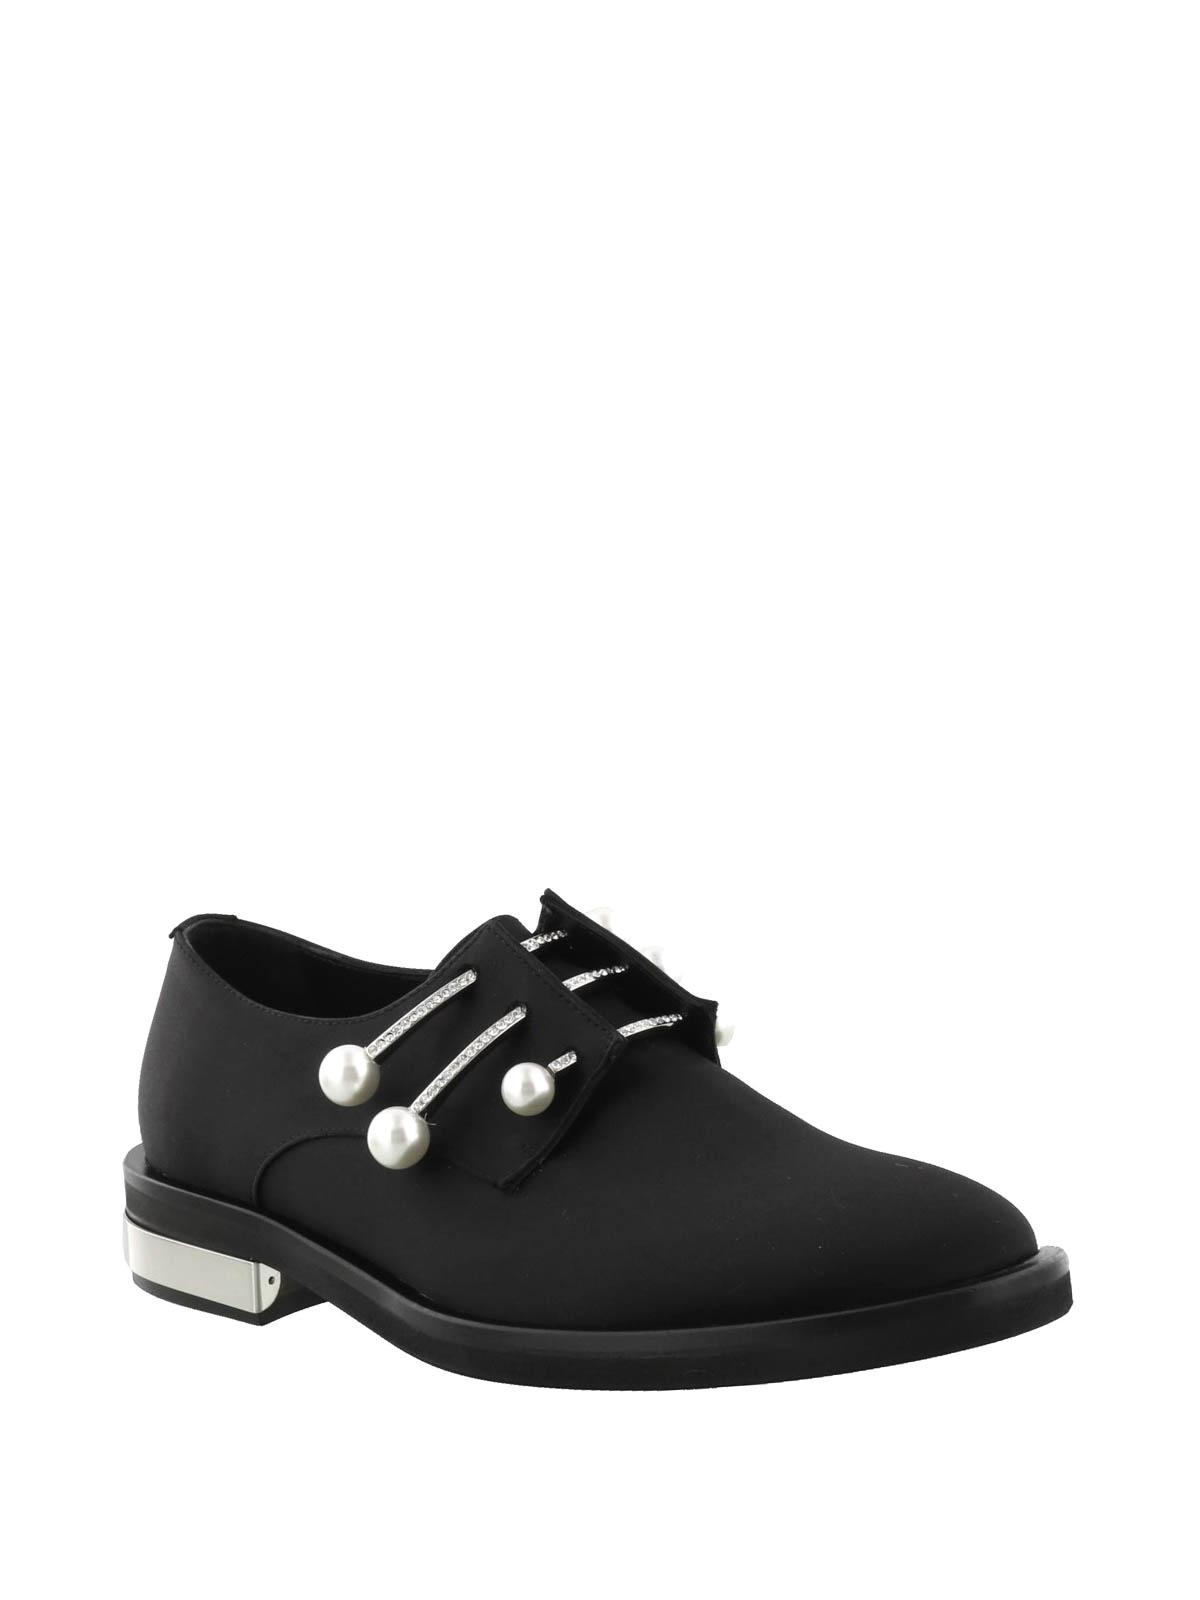 bd7bbdb5bc Coliac - Fernanda black satin Derby shoes - lace-ups shoes - CL602BLACK